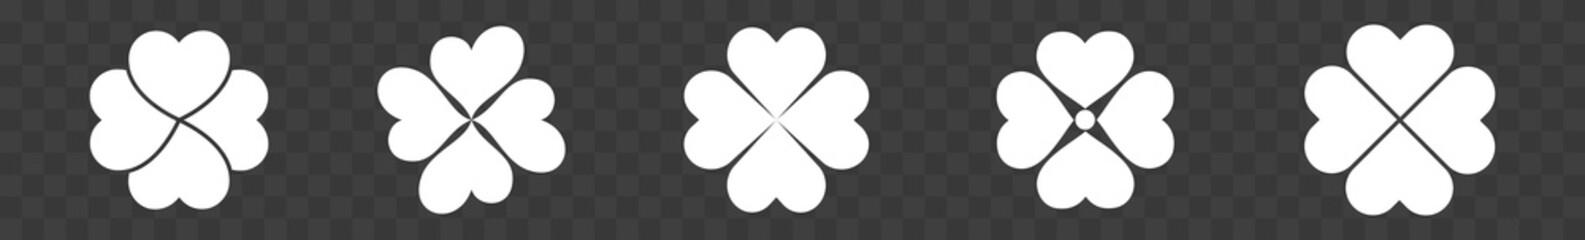 Shamrock Icon White   Shamrocks   Four Leaf Clover   Irish Symbol   St. Patrick's Day Logo   Luck Sign   Isolated   Variations